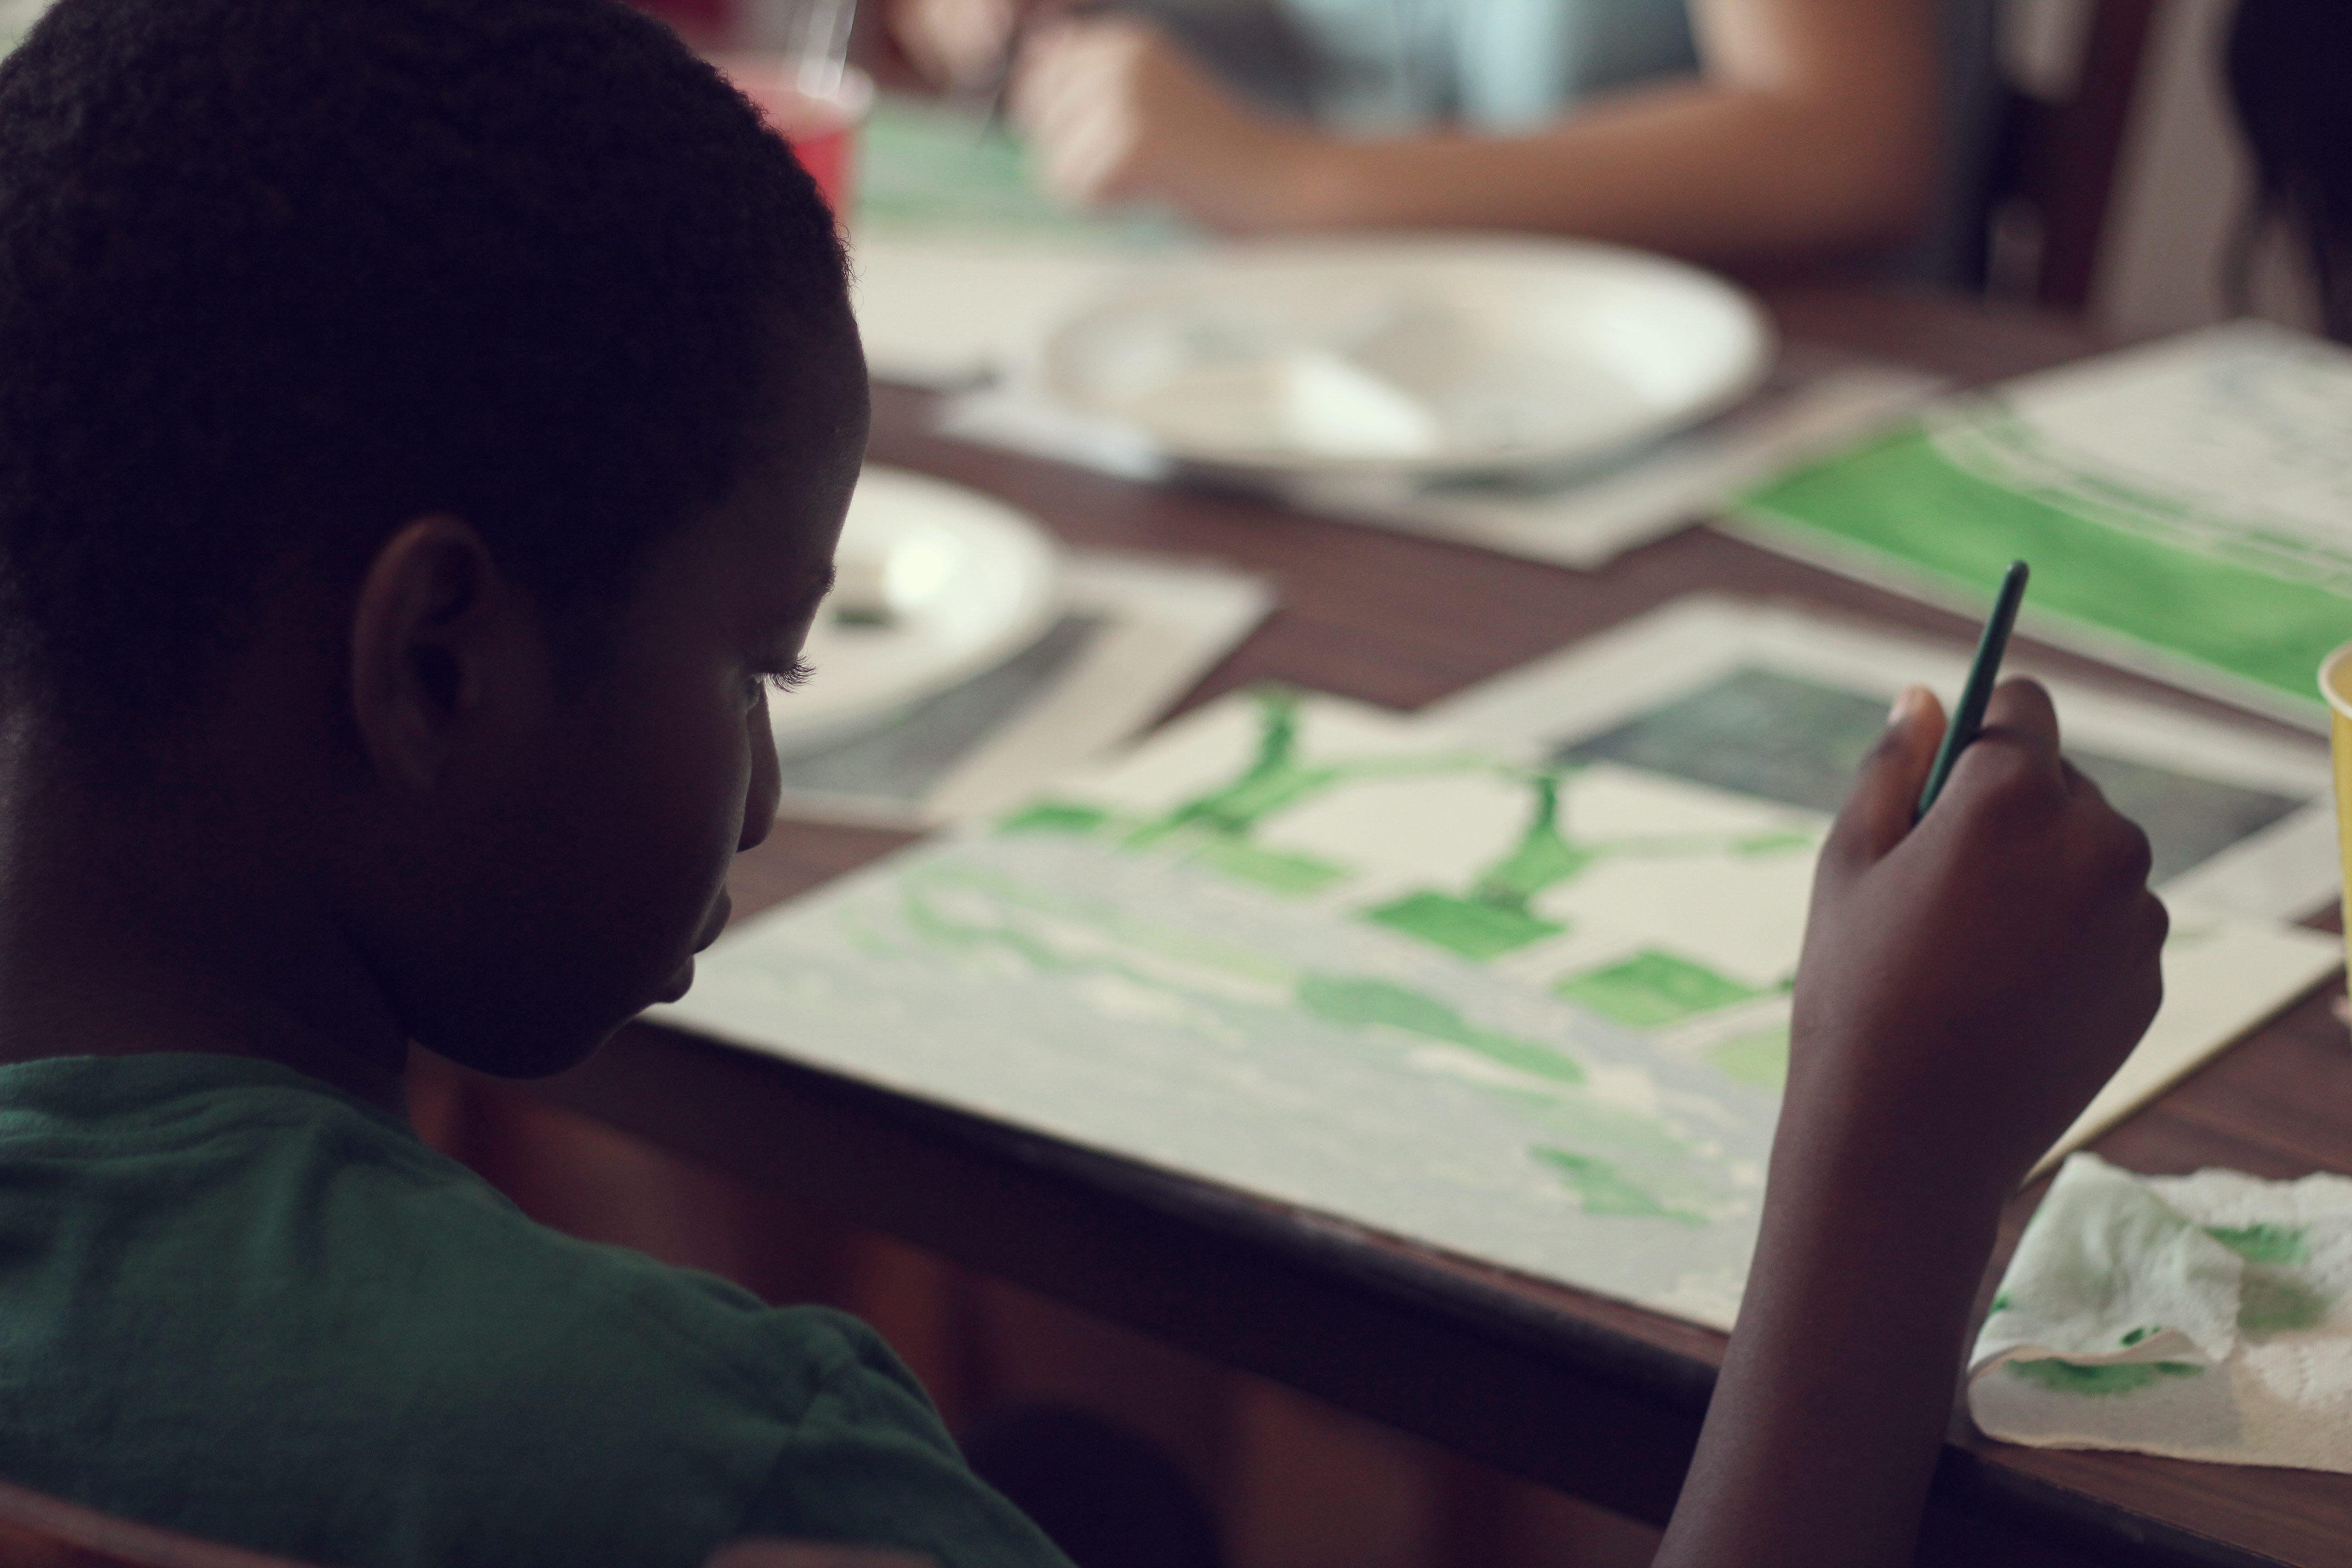 Why We Serve Children Through the Arts